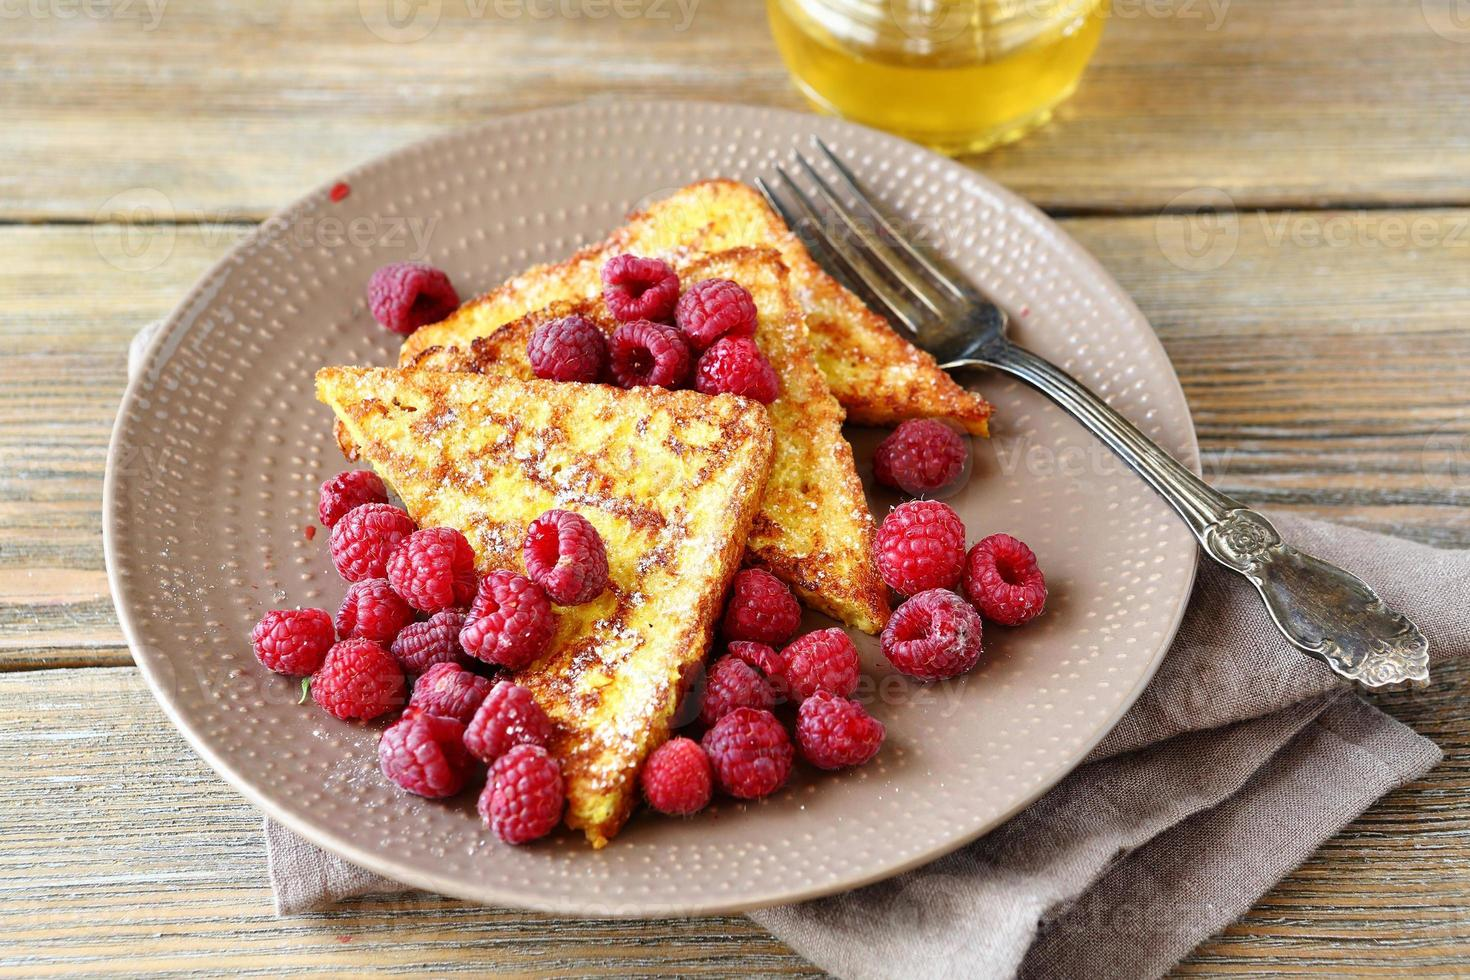 Tasty French toast with fresh raspberries photo